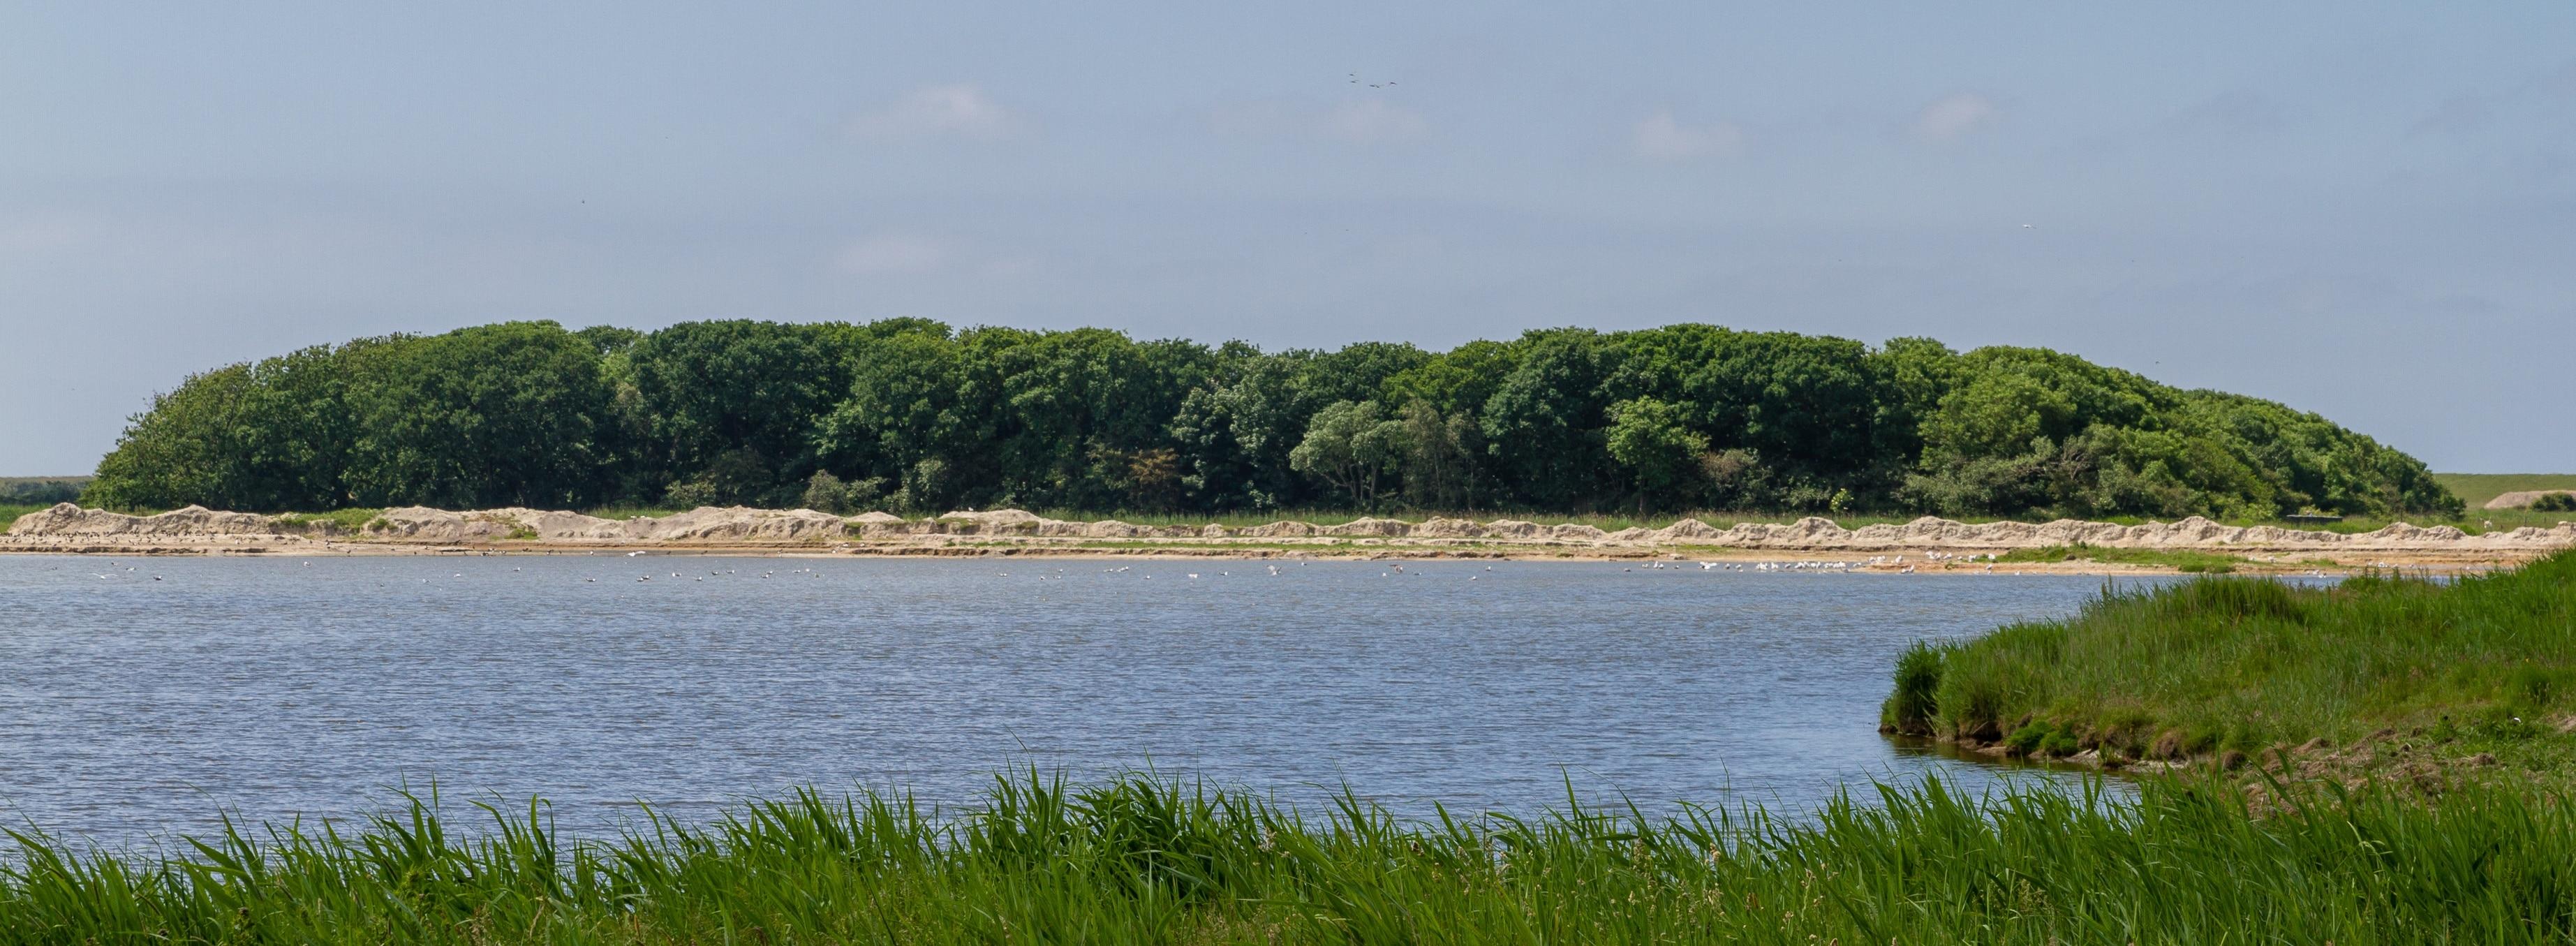 Oldsum, Schleswig-Holstei